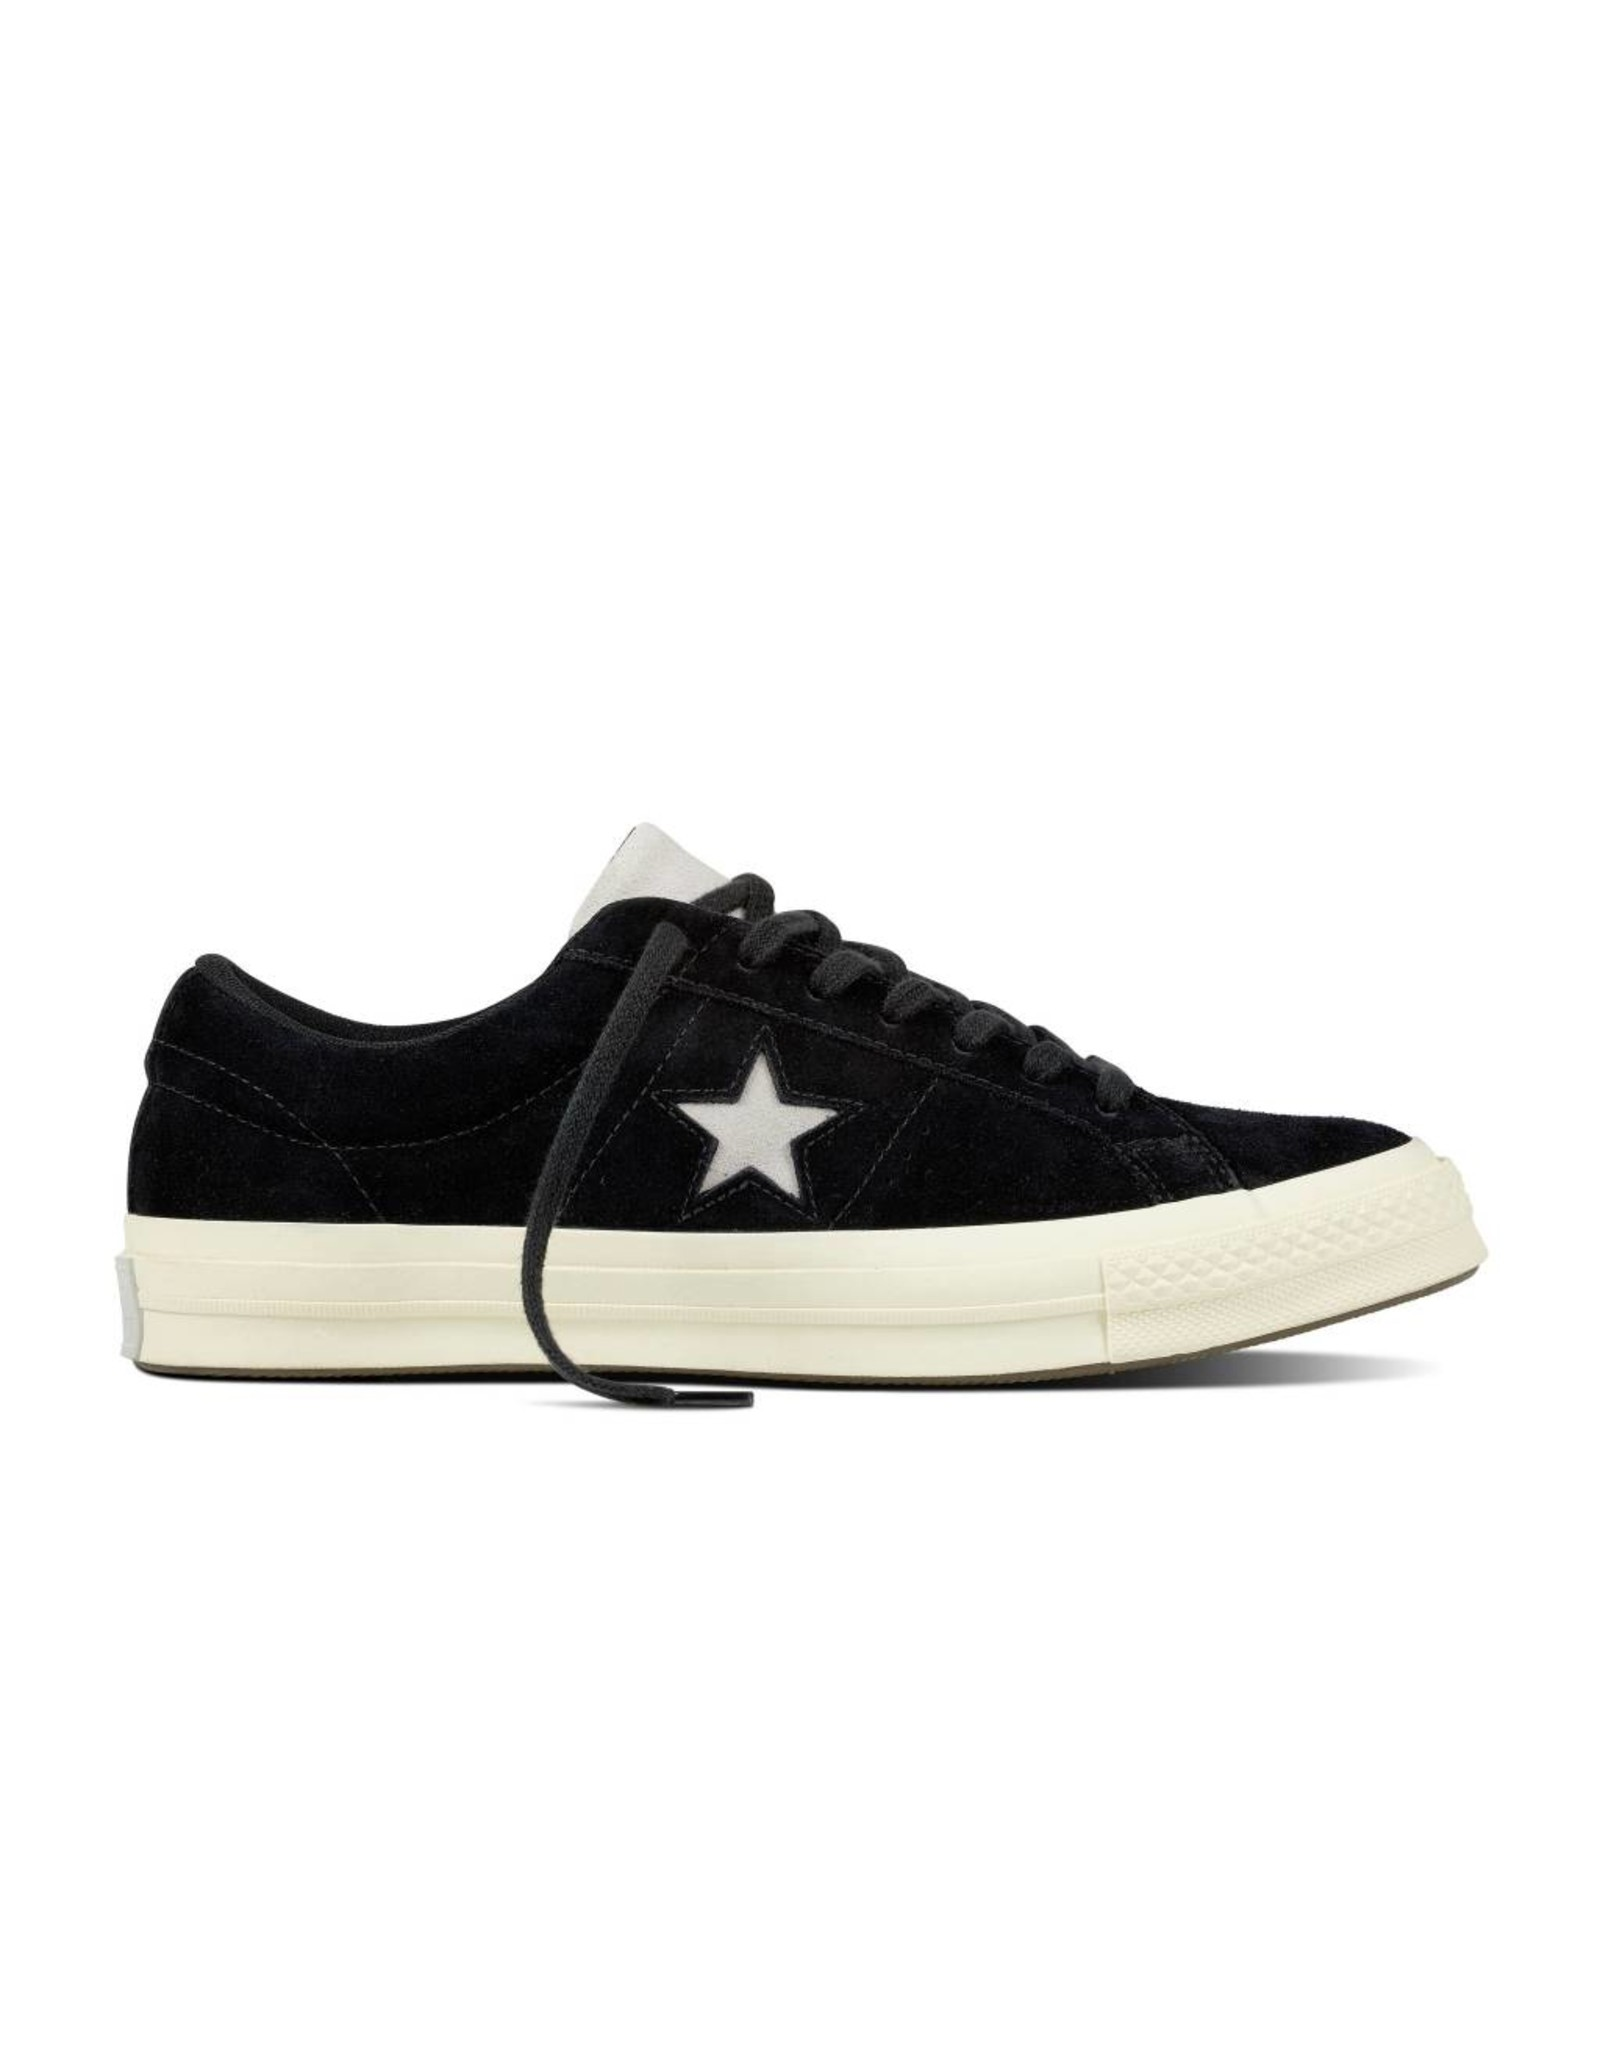 CONVERSE ONE STAR OX CUIR BLACK/MOUSE/EGRET C887MOU-160584C